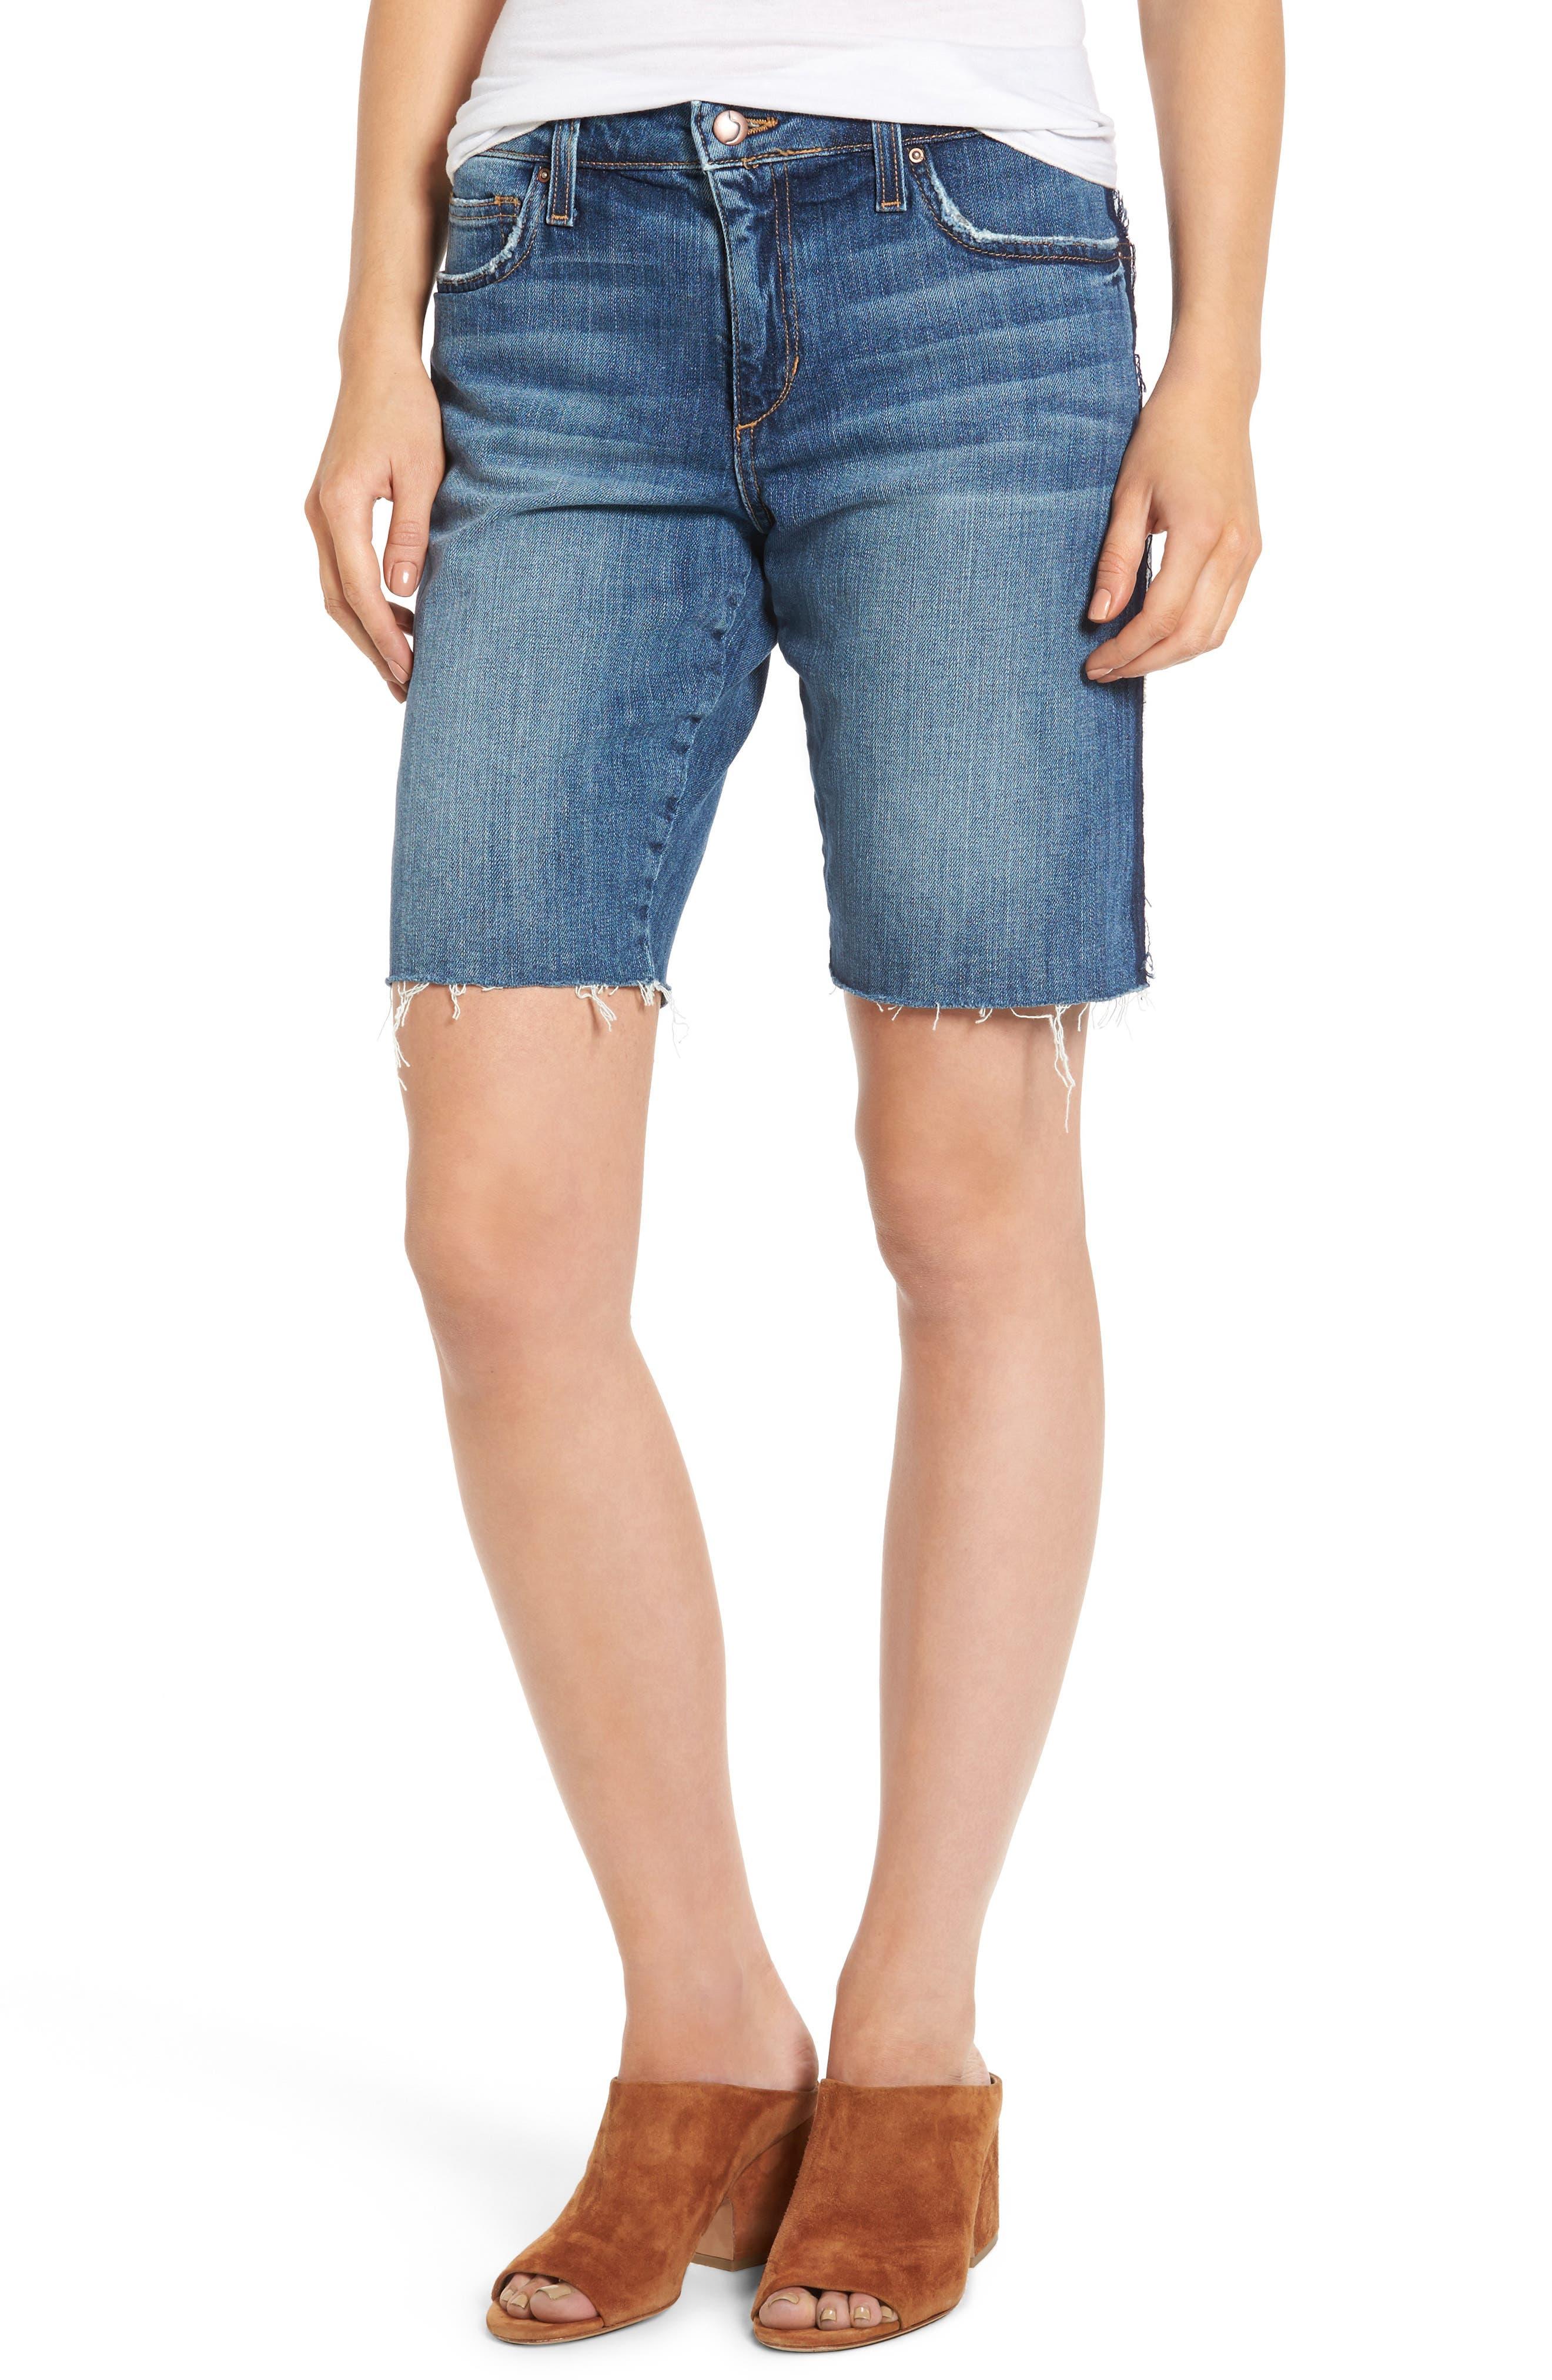 JOES Reworked Denim Bermuda Shorts